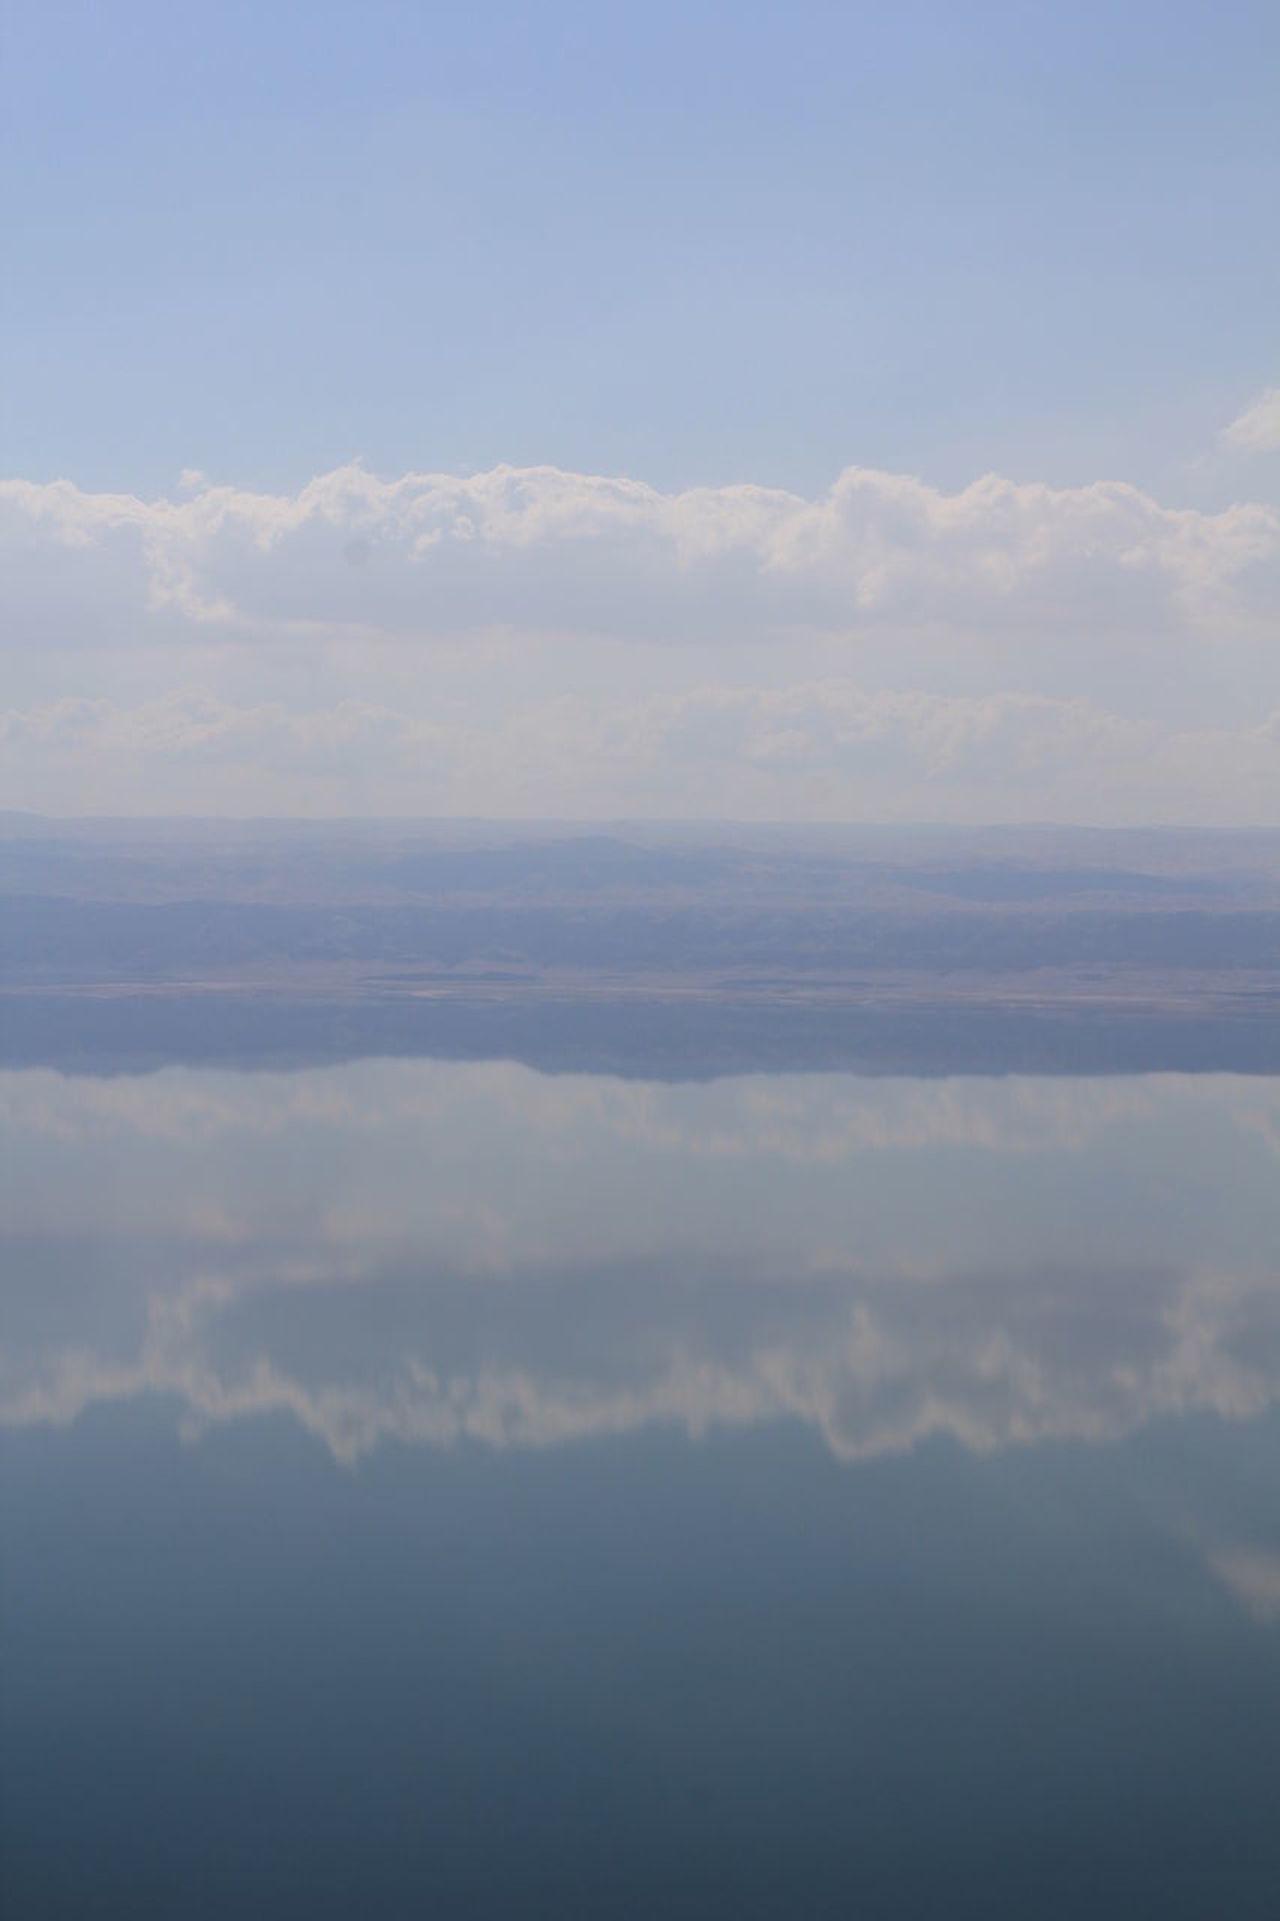 Beauty In Nature Day Dead Sea  Deadsea Nature No People Outdoors Scenics Sea Sky Tranquil Scene Tranquility Water Reflection Water Reflections